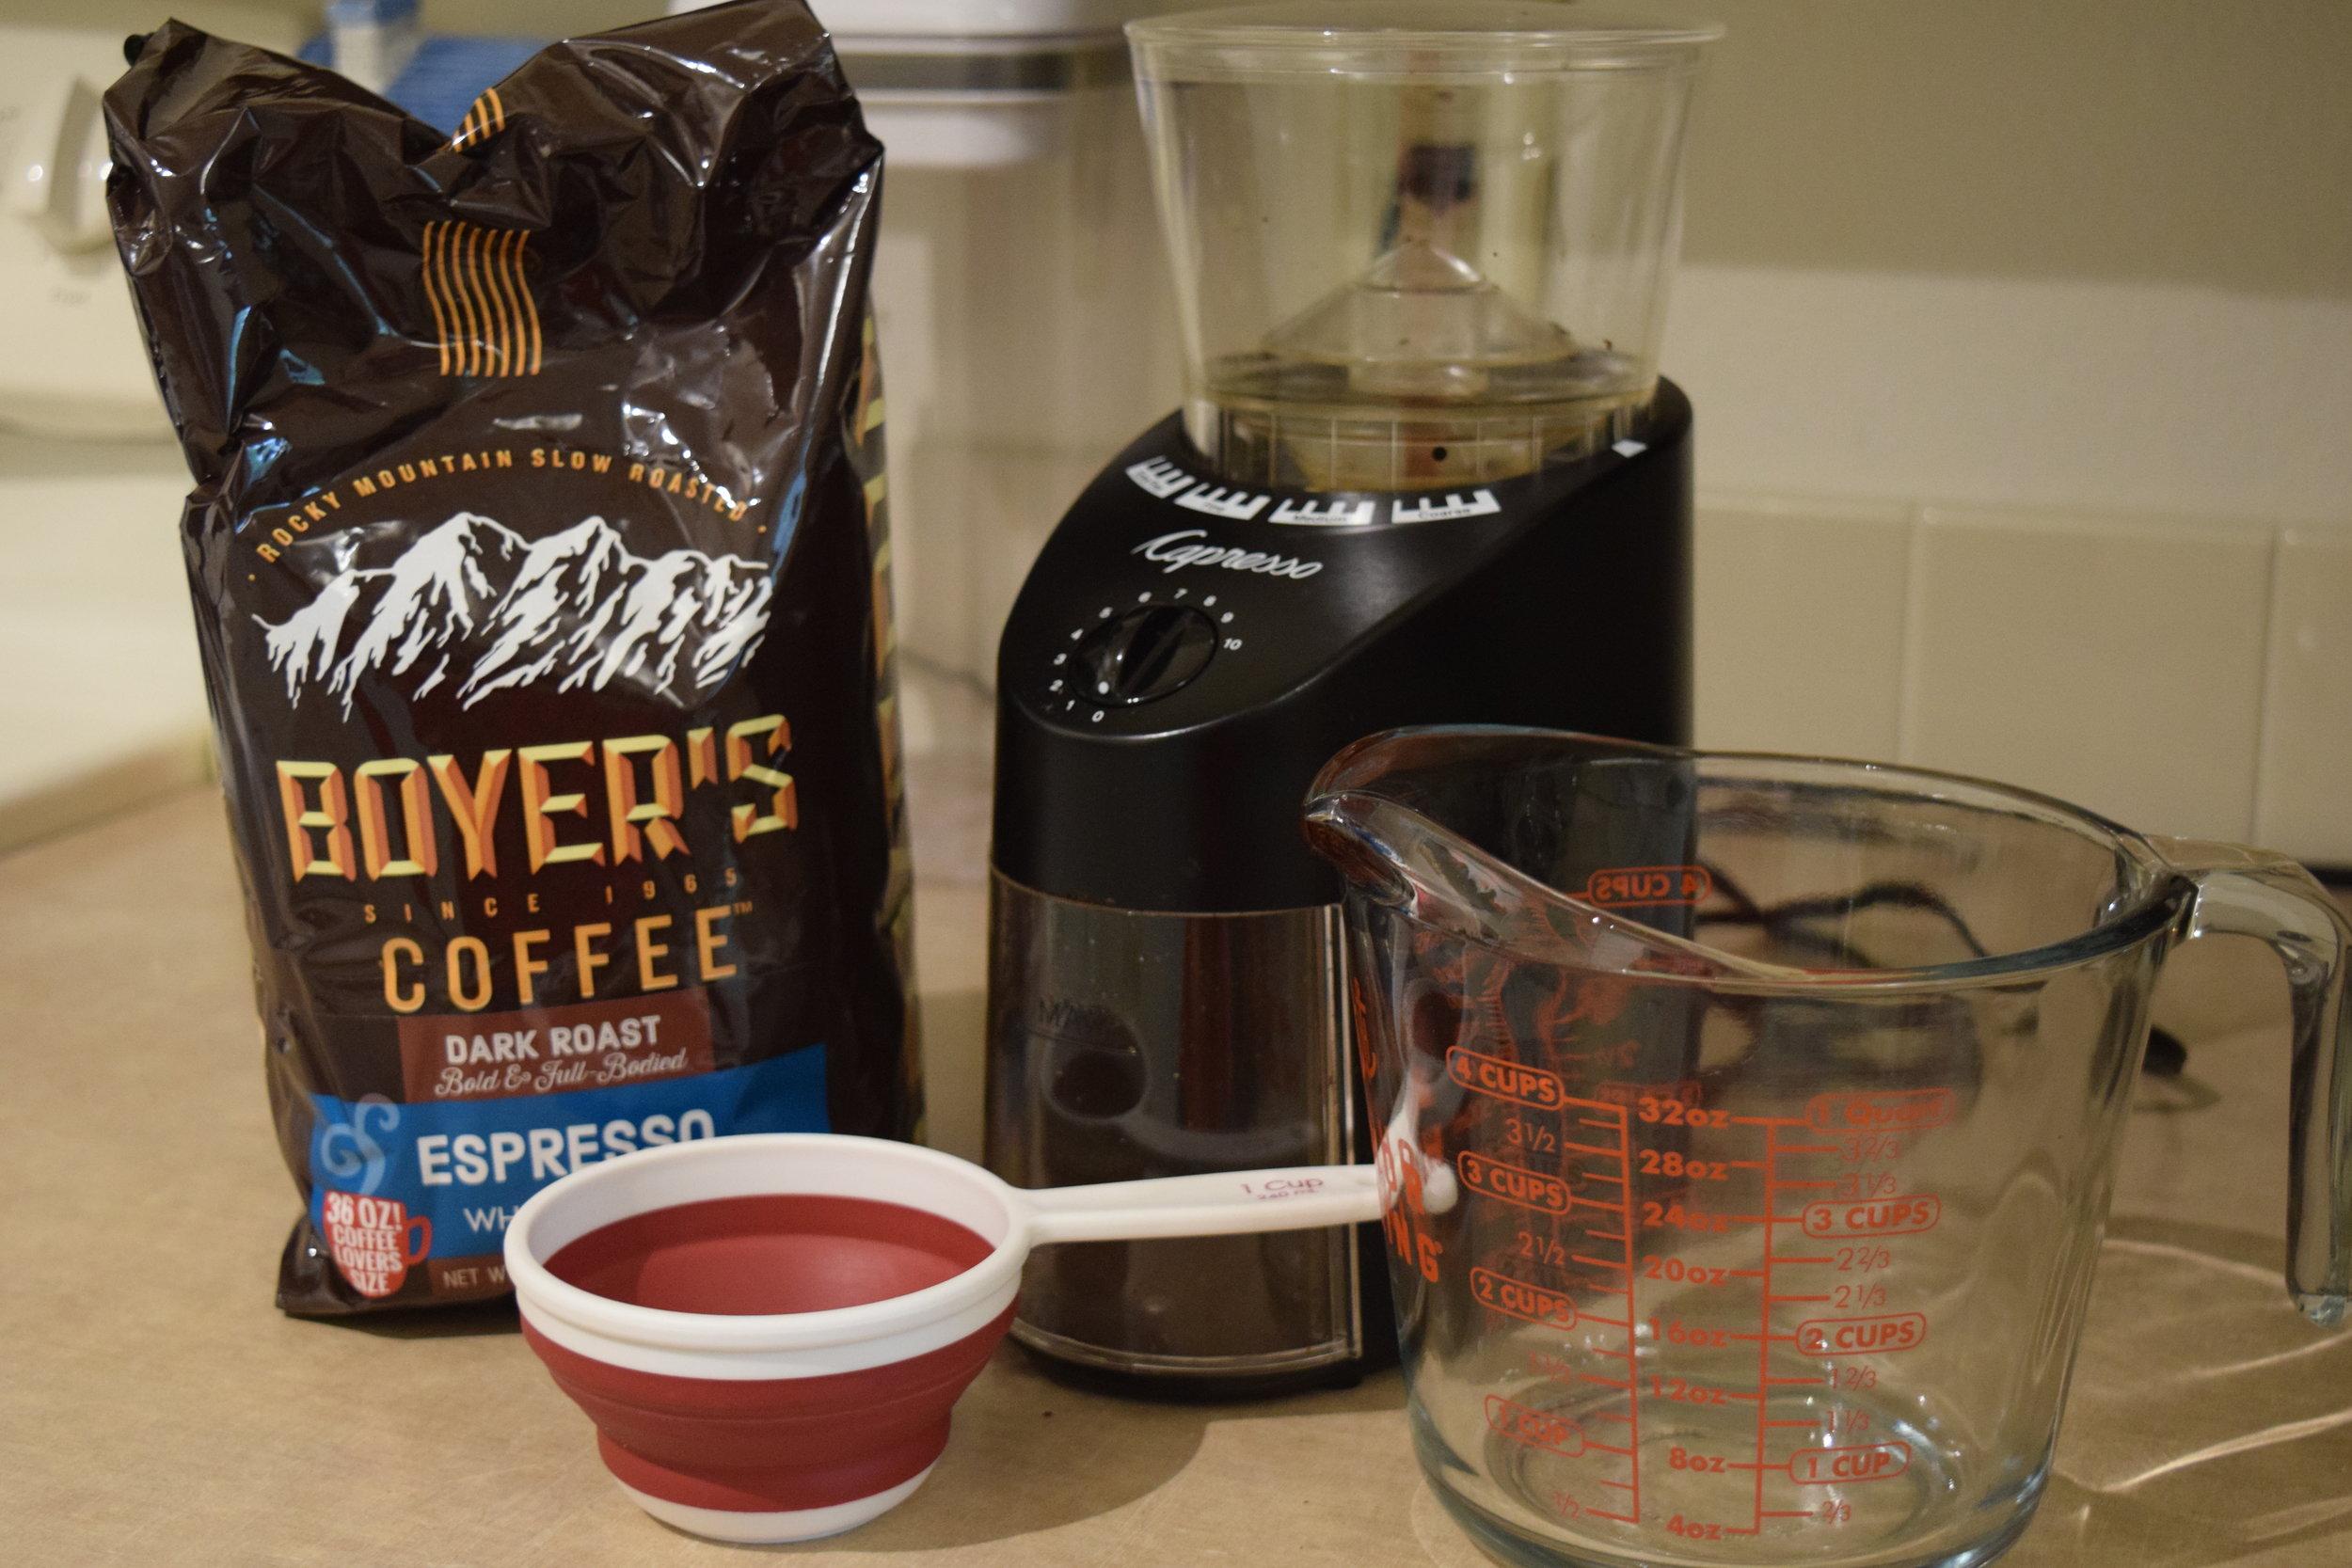 capresso_grinder_boyers_coffee.JPG